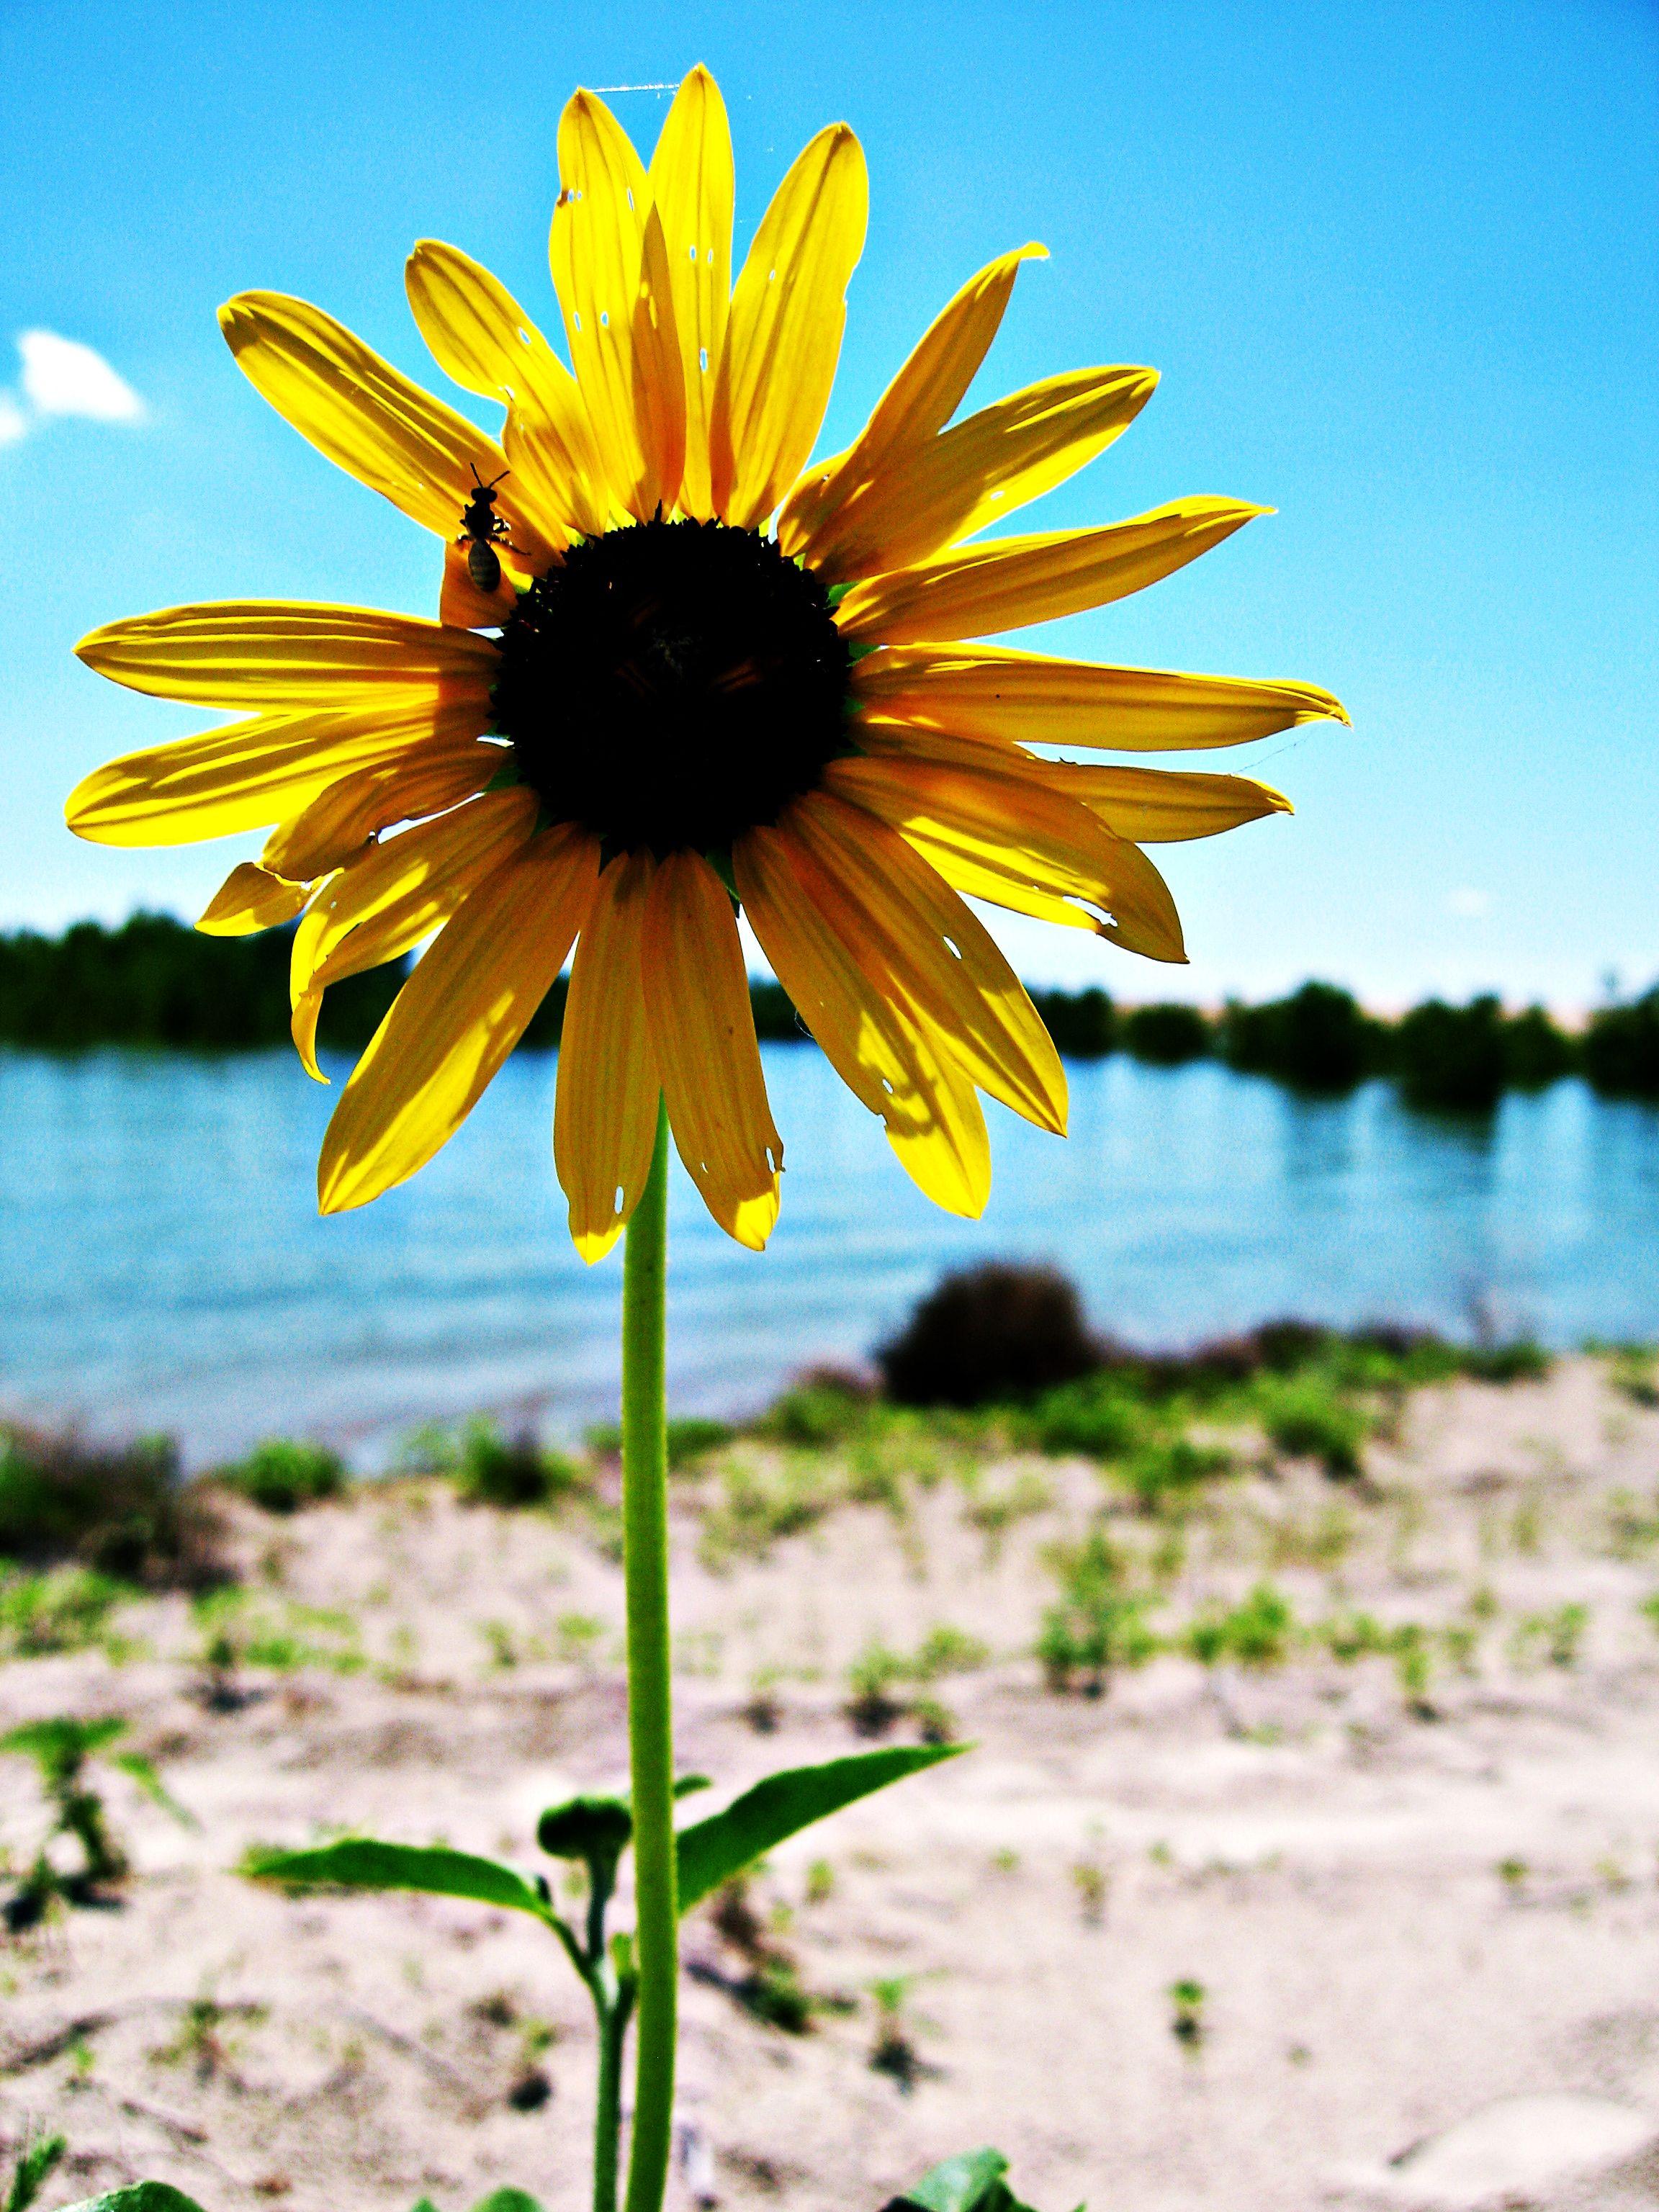 Sunflowers at Lake McConaughy